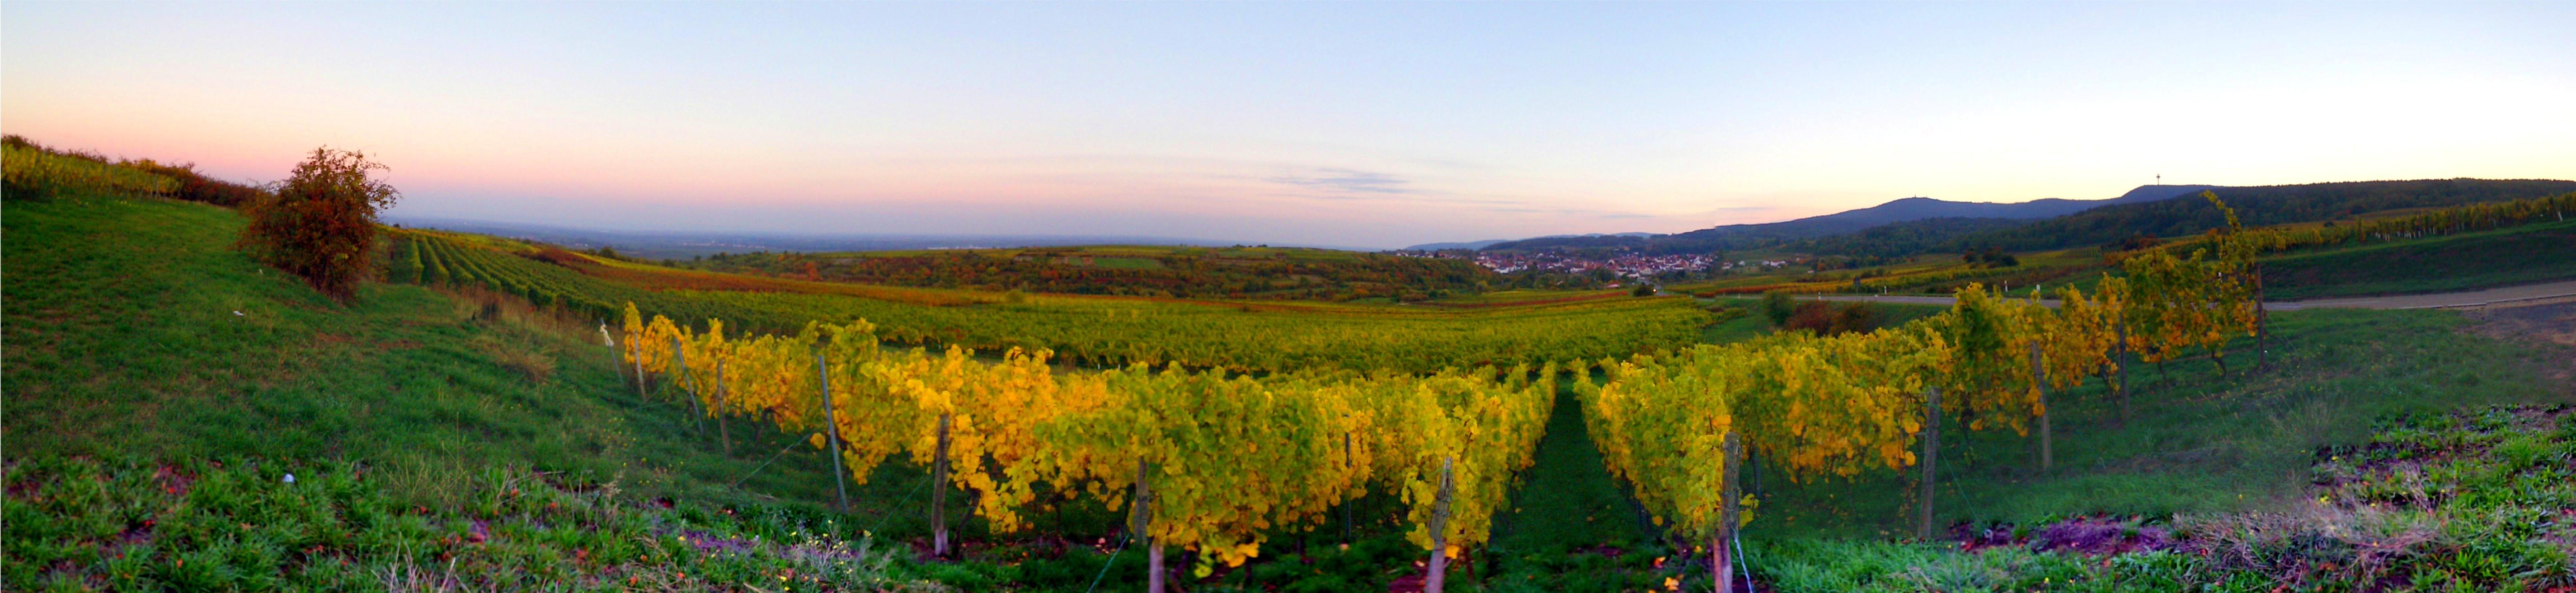 DB0NIX Leistadt panorama